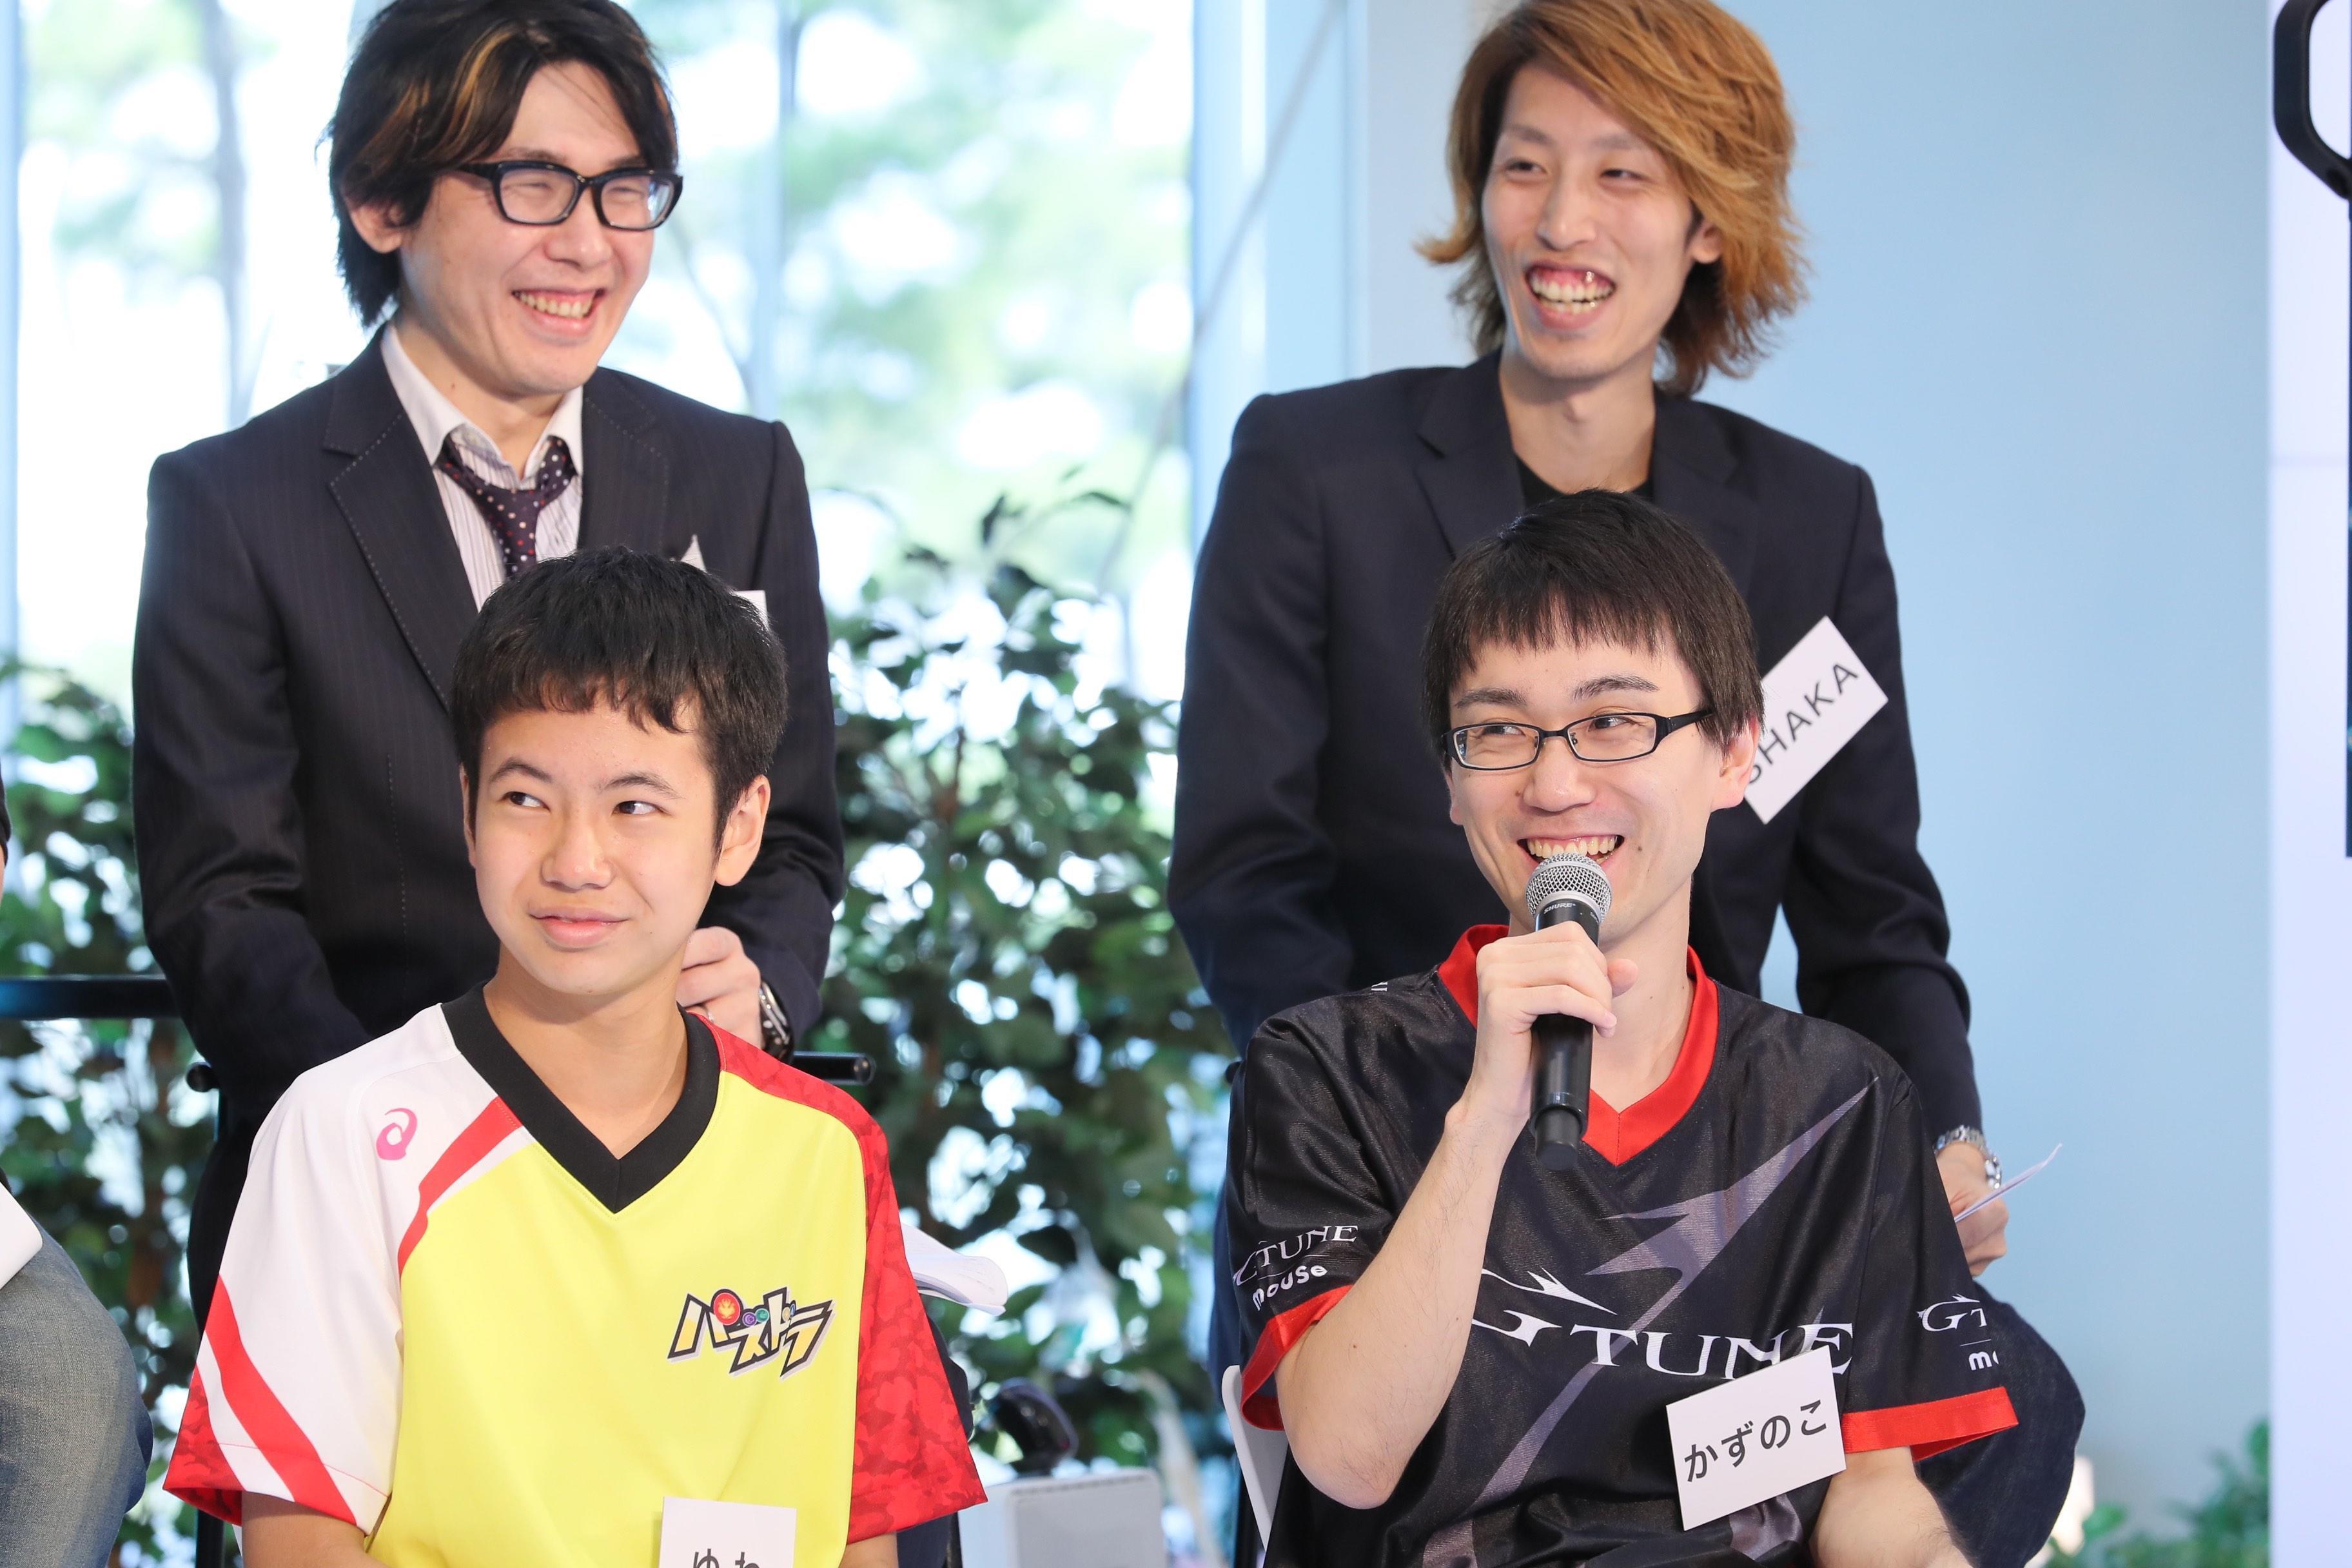 http://news.yoshimoto.co.jp/20180925045851-ddcb449c06e212380f6895749c4151c7c1b12a00.jpg